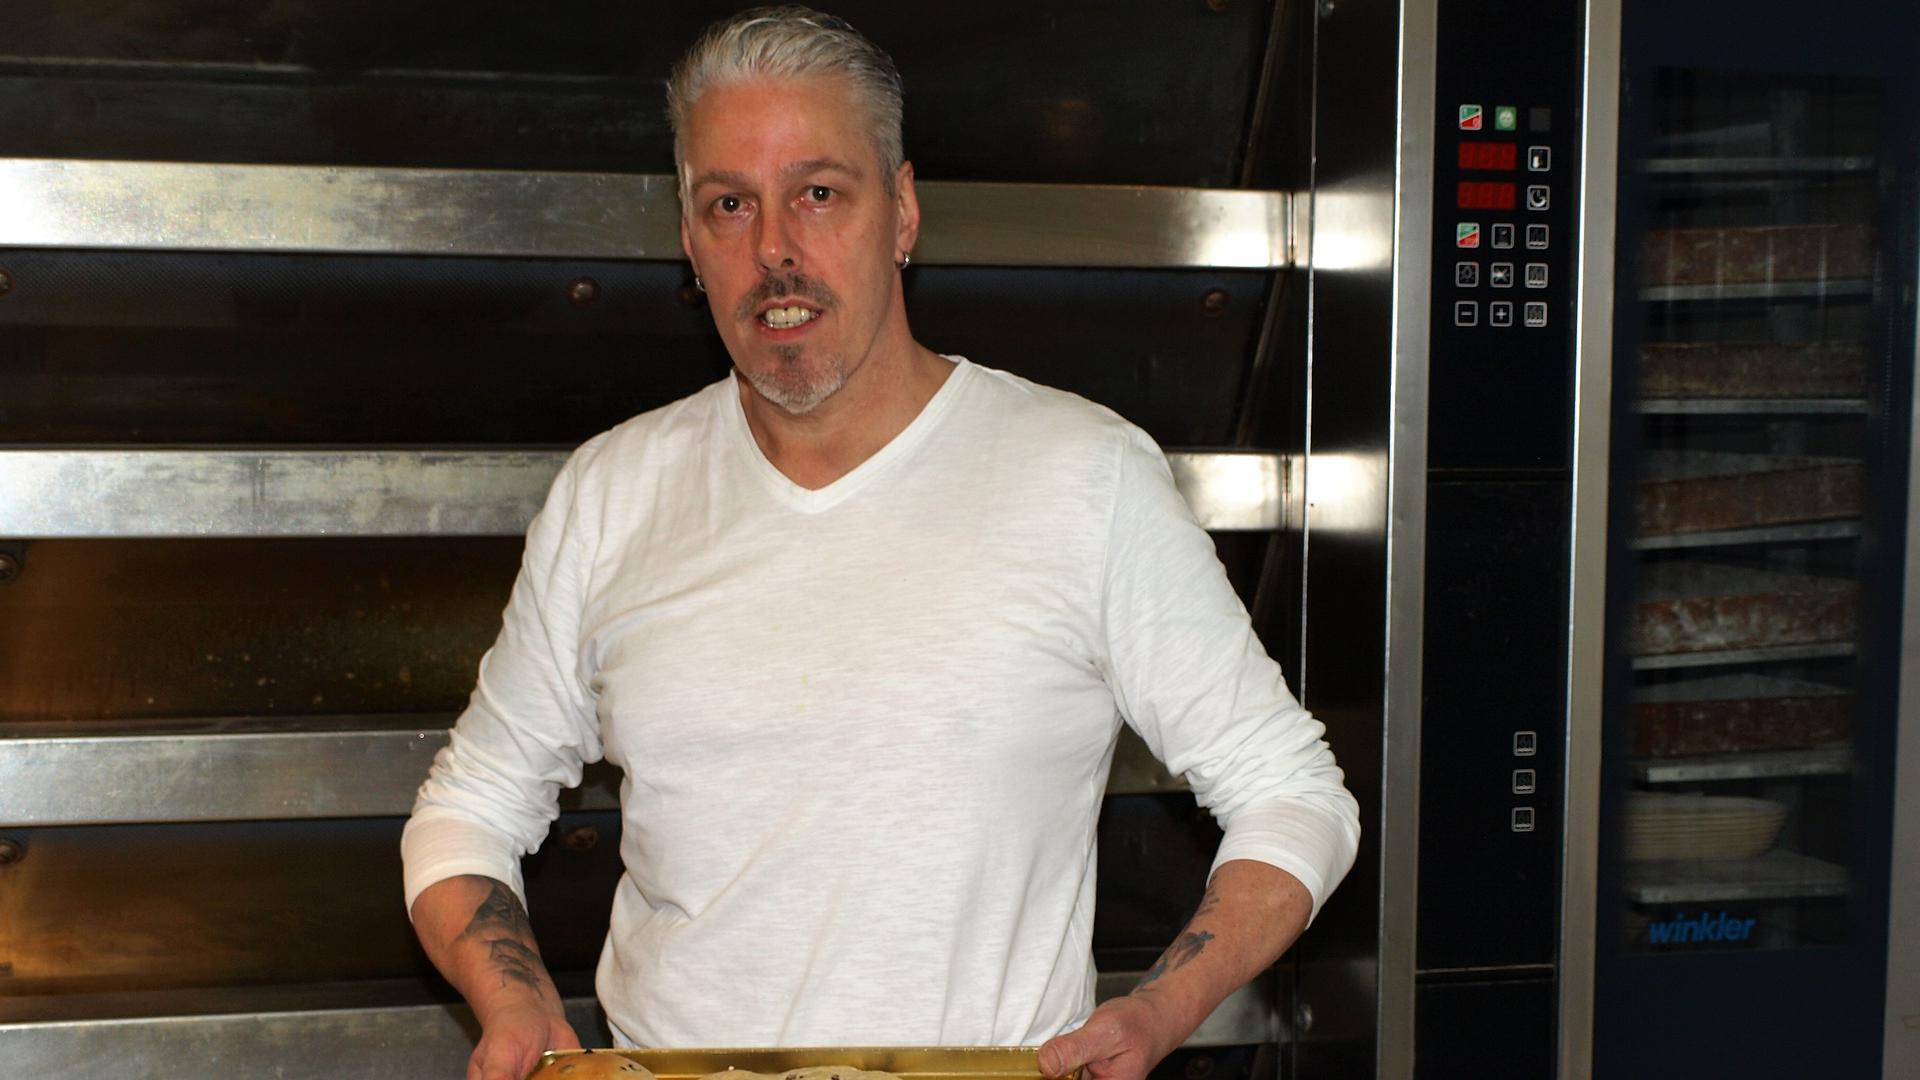 Bäckermeister Maag in der Backstube mit veganen Backwaren.